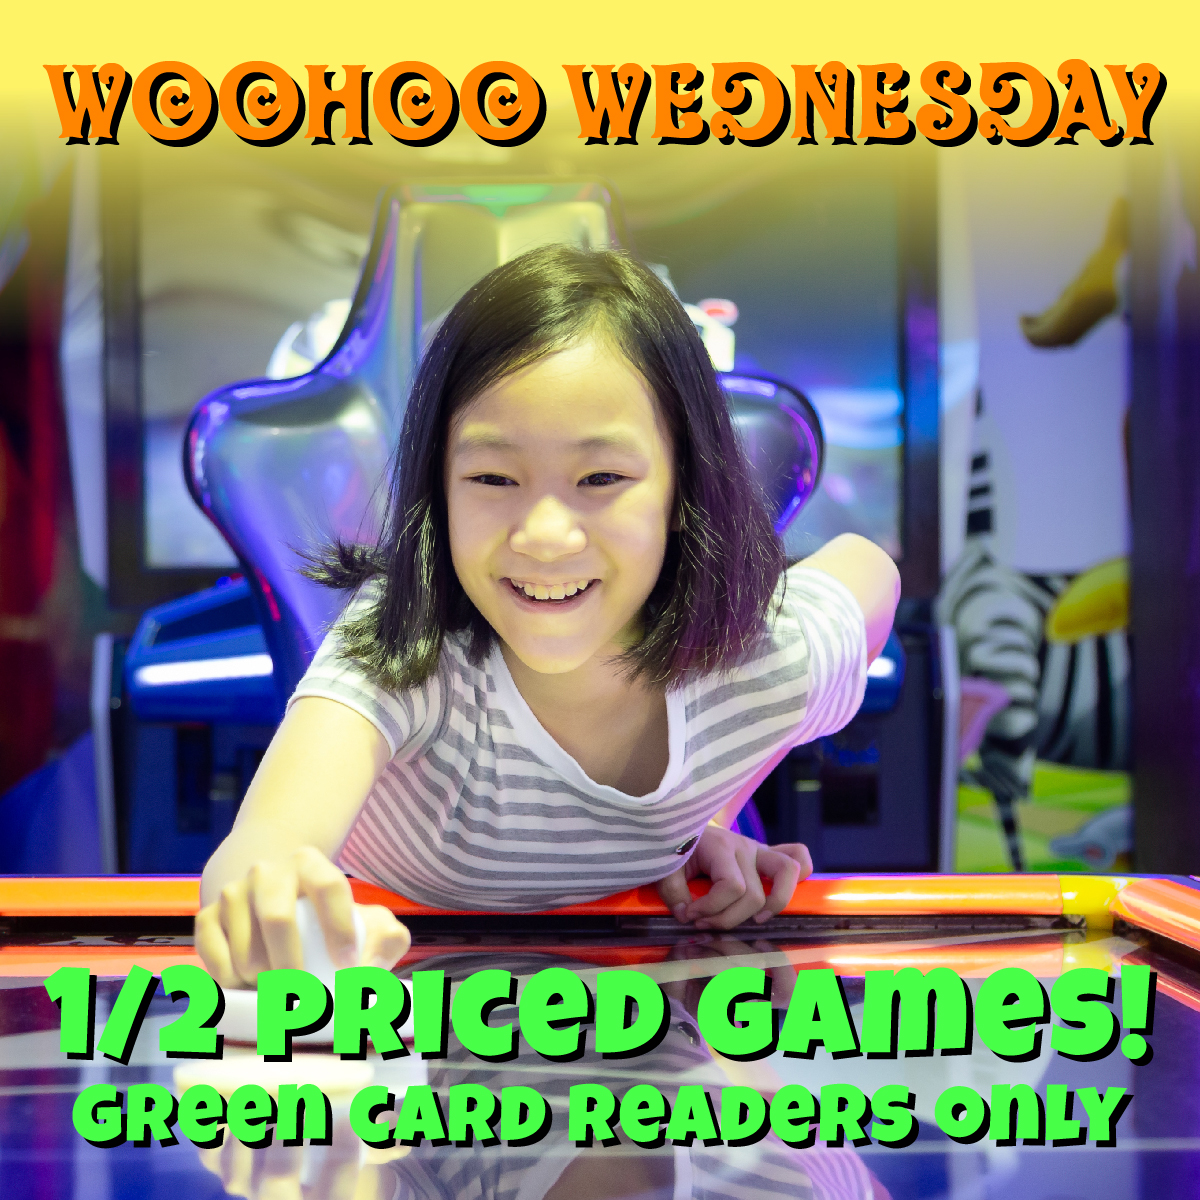 WooHoo Wednesday 1/2 Off Arcade Games